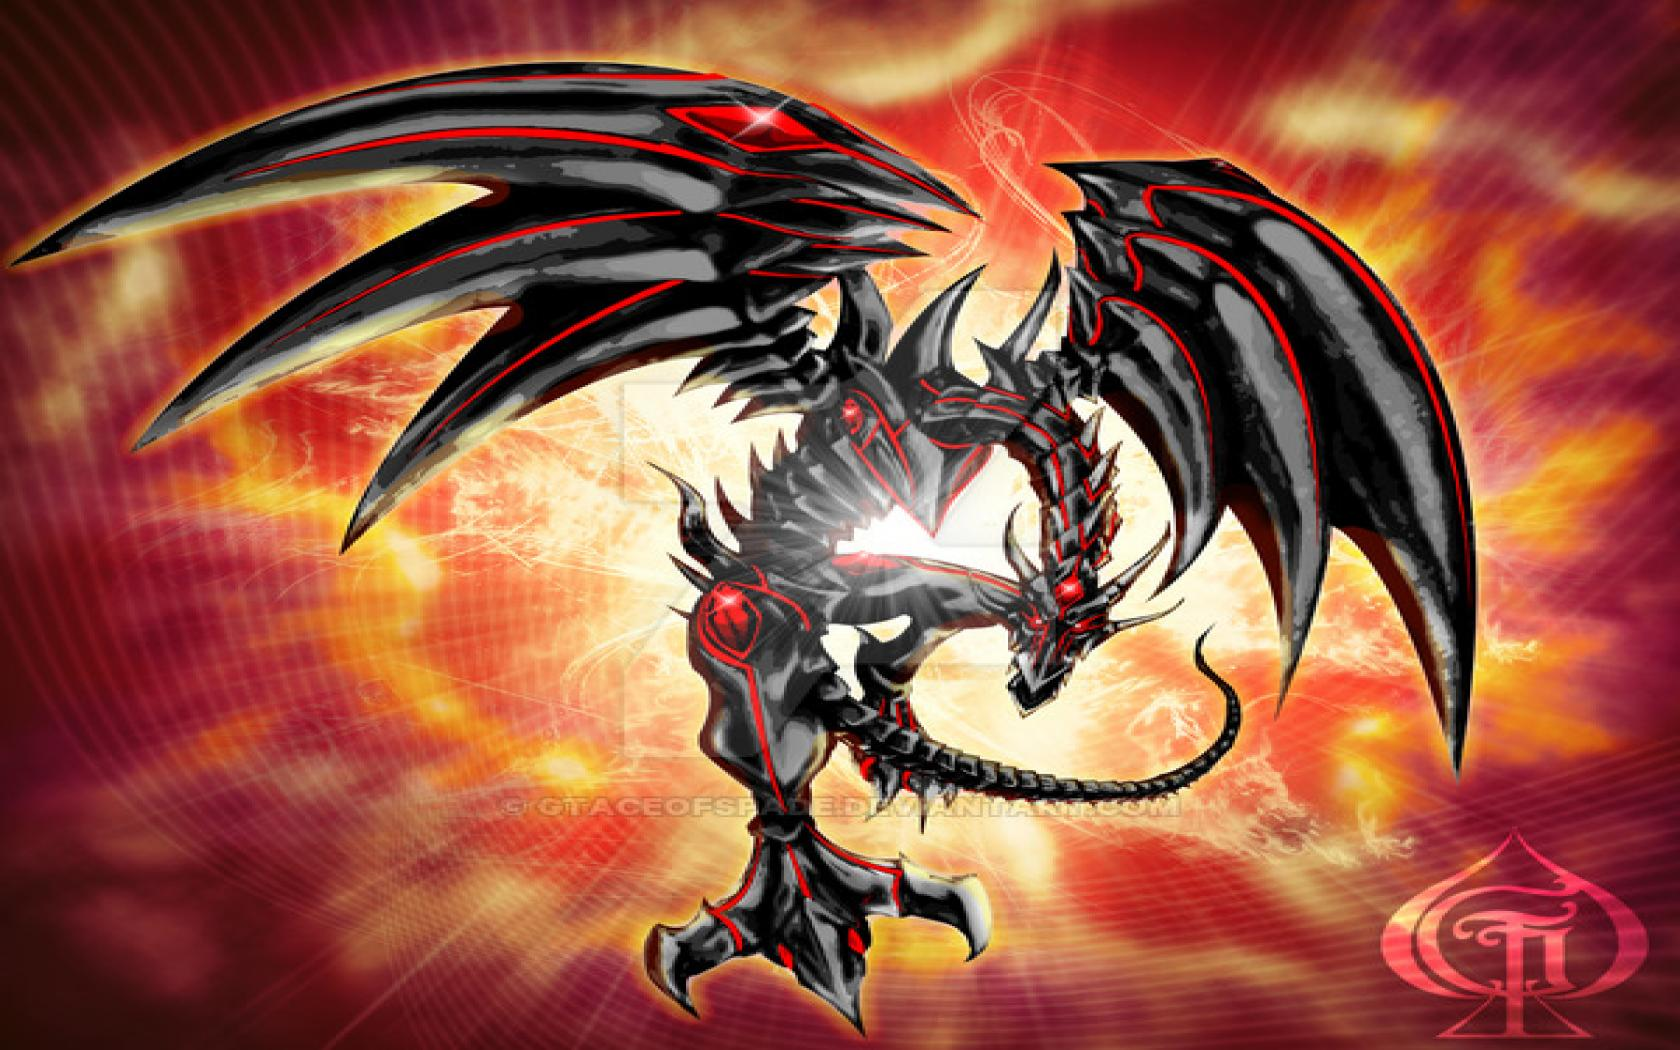 Red Eyes Black Dragon Wallpaper Red Eyes Darkness Metal Dragon 1680x1050 Wallpaper Teahub Io